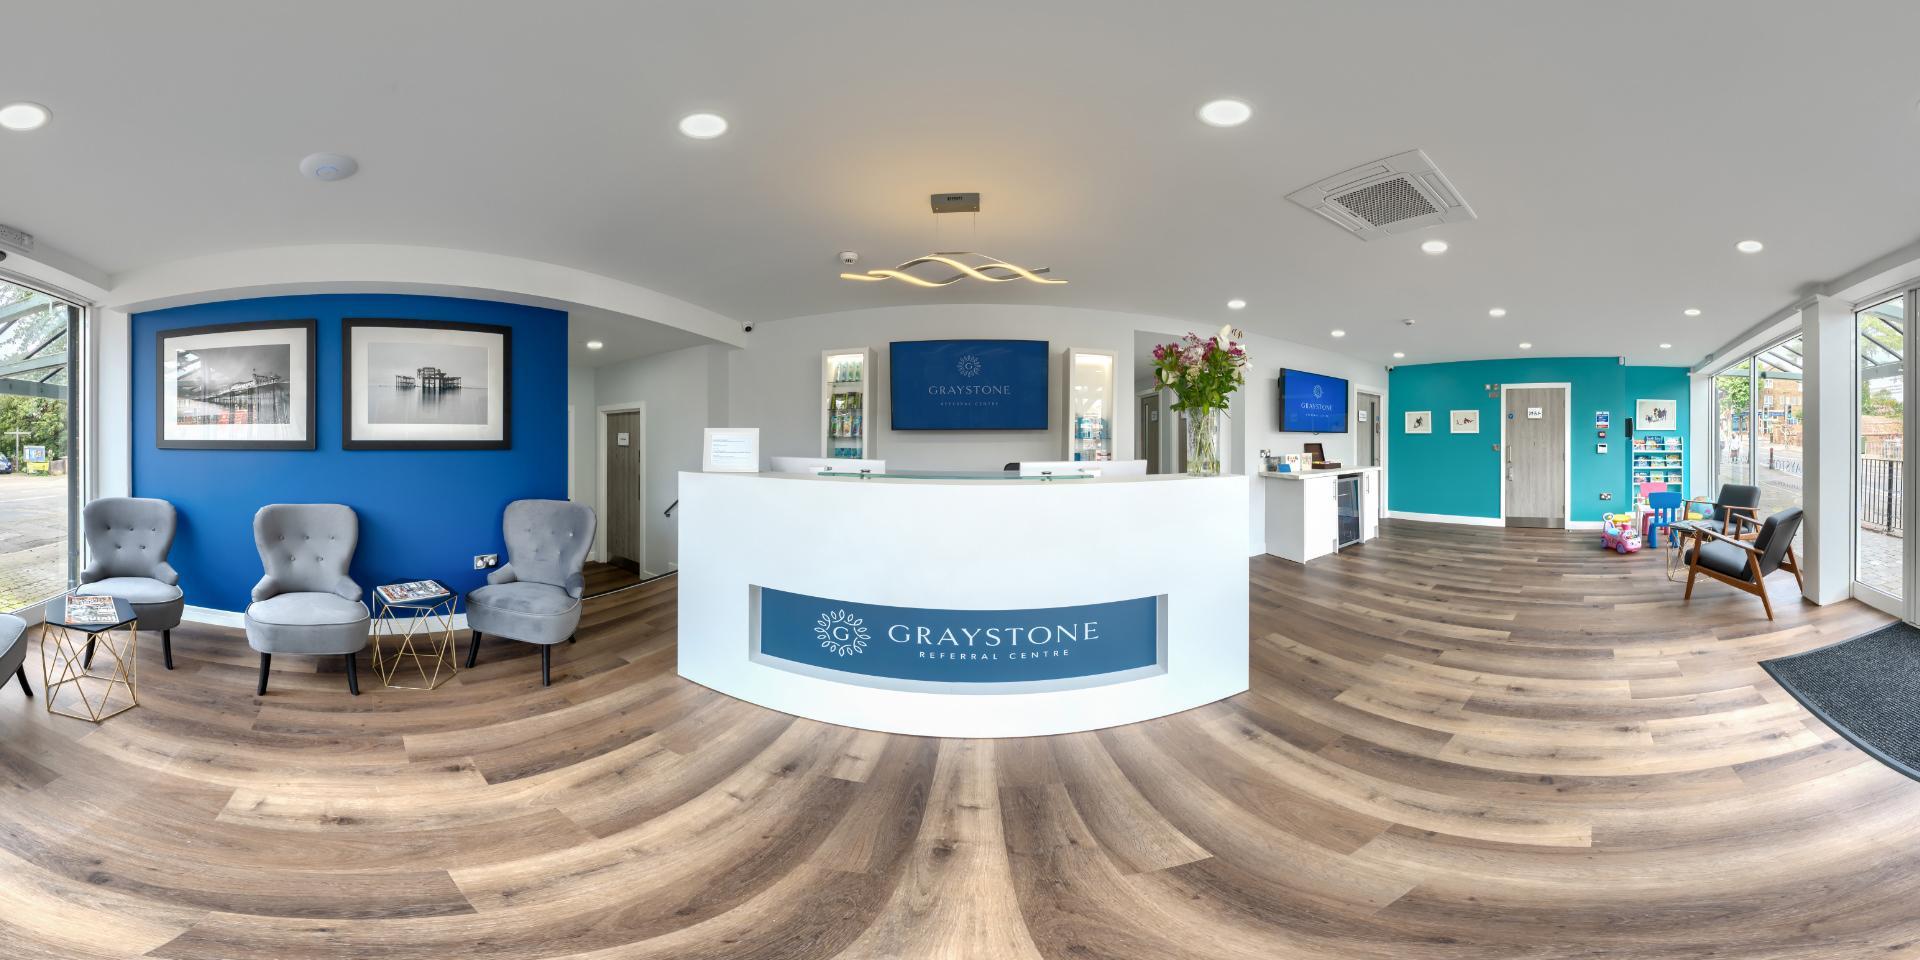 Graystone Referral Centre – Hassocks